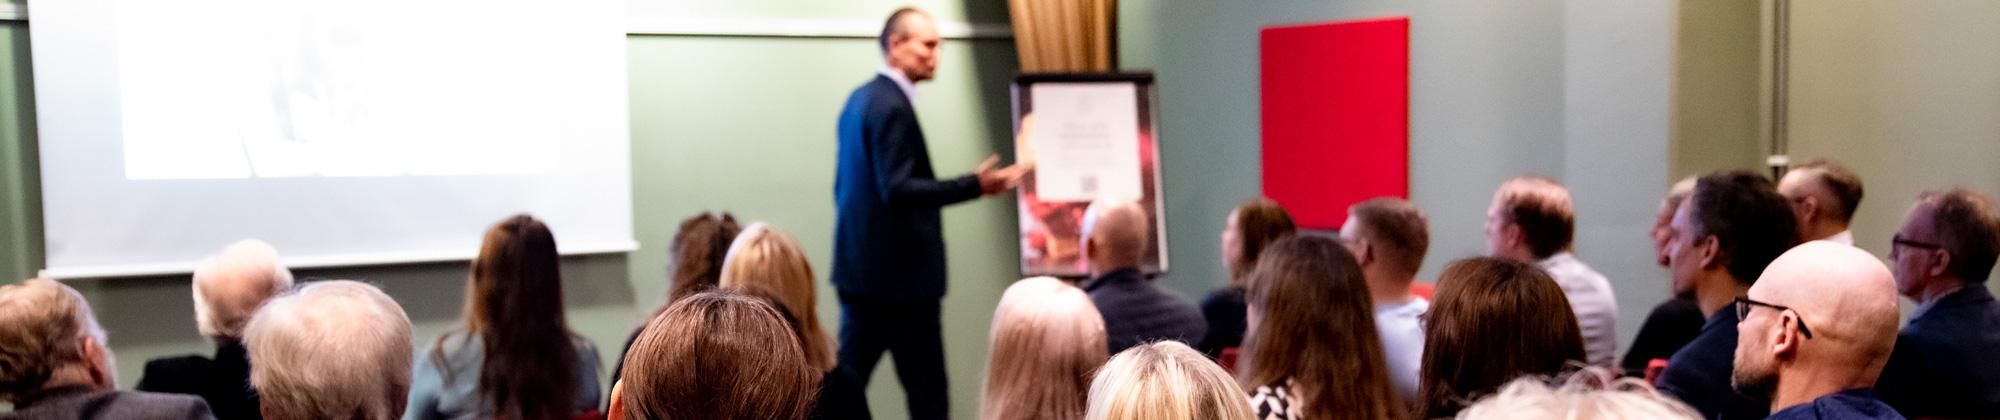 Talare Peter Åberg i januari 2020